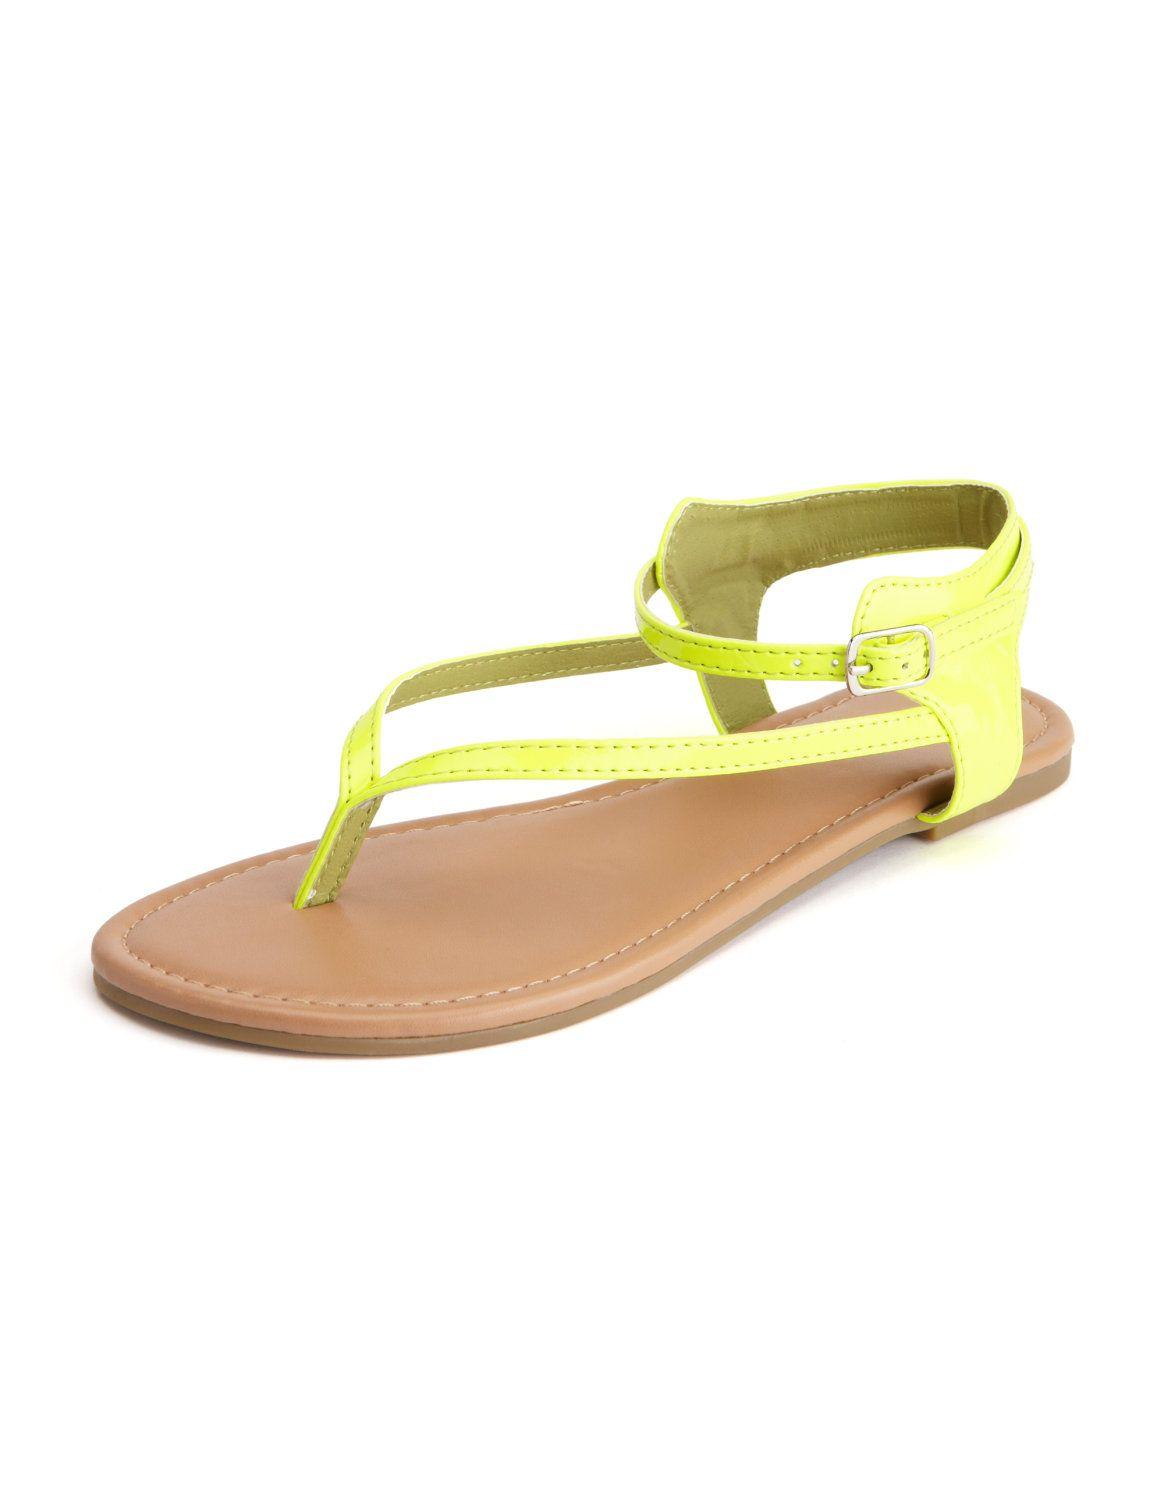 Ankle-Wrap Patent Thong Sandal